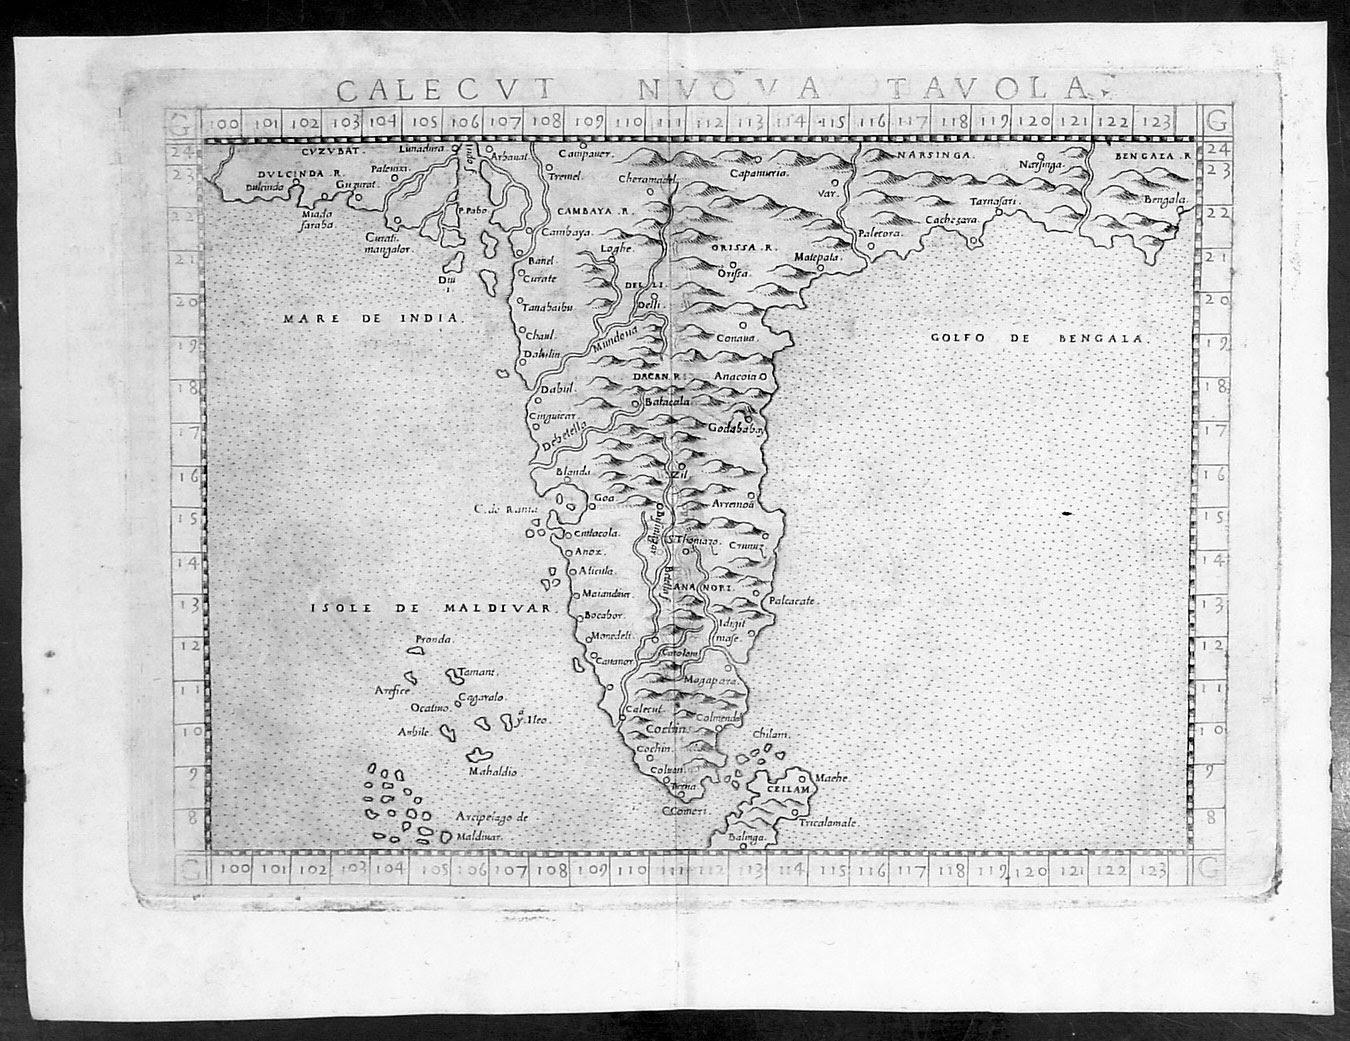 http://www.columbia.edu/itc/mealac/pritchett/00routesdata/1700_1799/malabar/malabarmaps/ruscelli1574.jpg